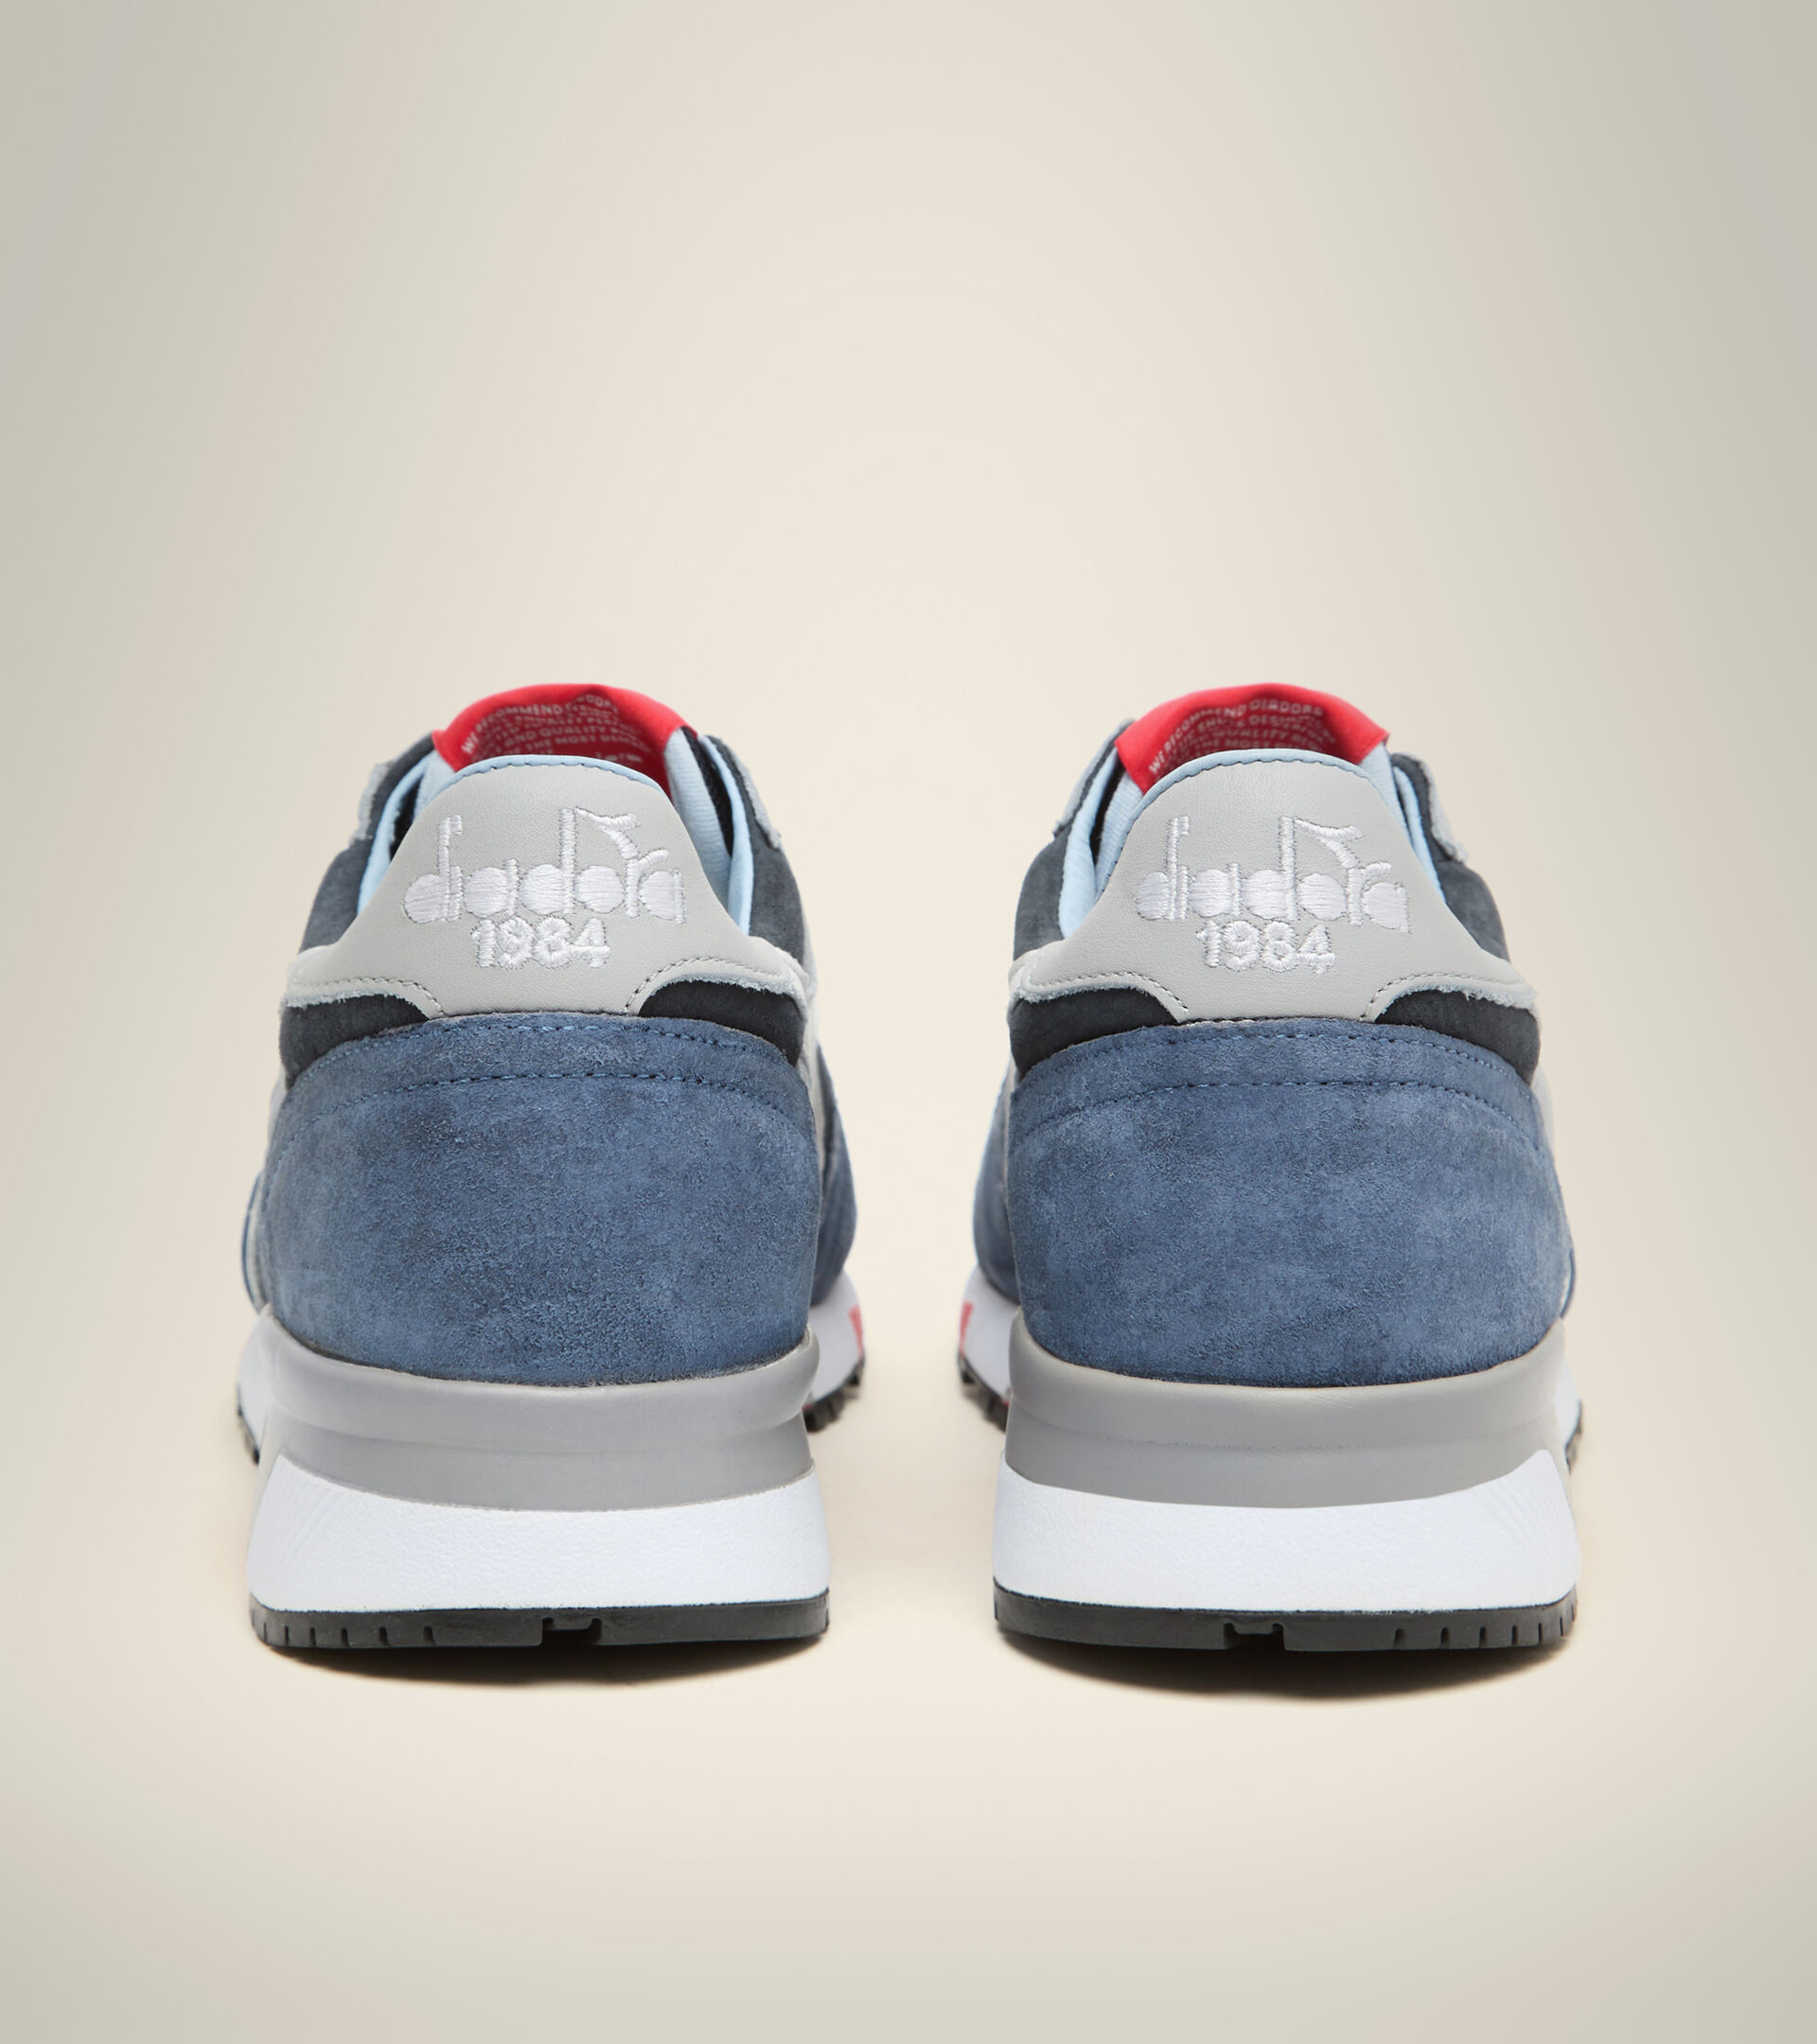 Footwear Heritage UOMO TRIDENT 90 SUEDE SW BLUE DENIM Diadora